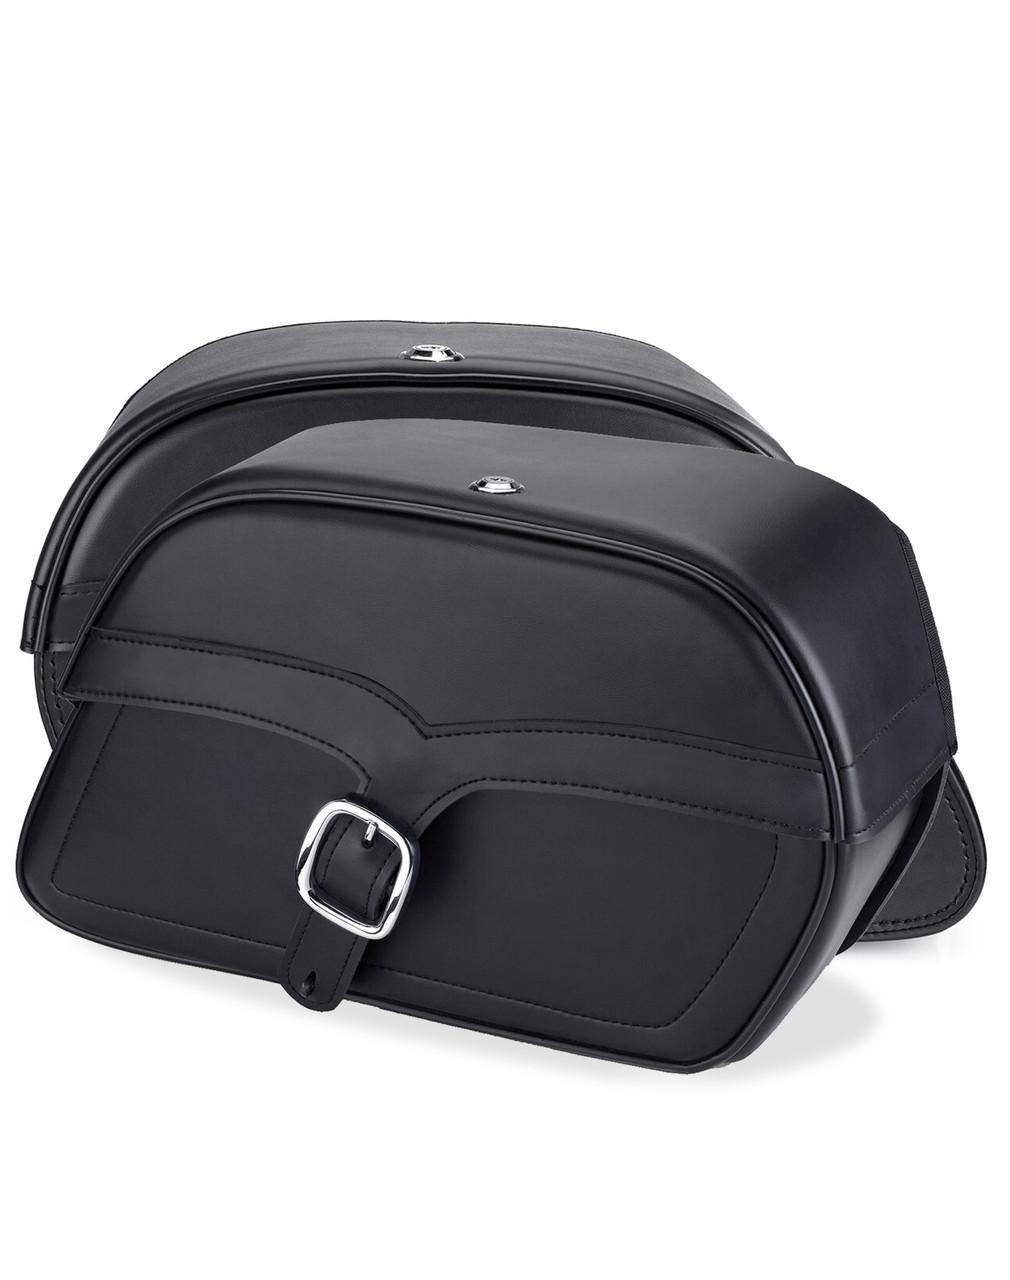 Honda VTX 1800 N Single Strap Shock Cutout Slanted Large Motorcycle Saddlebags Both Bags View